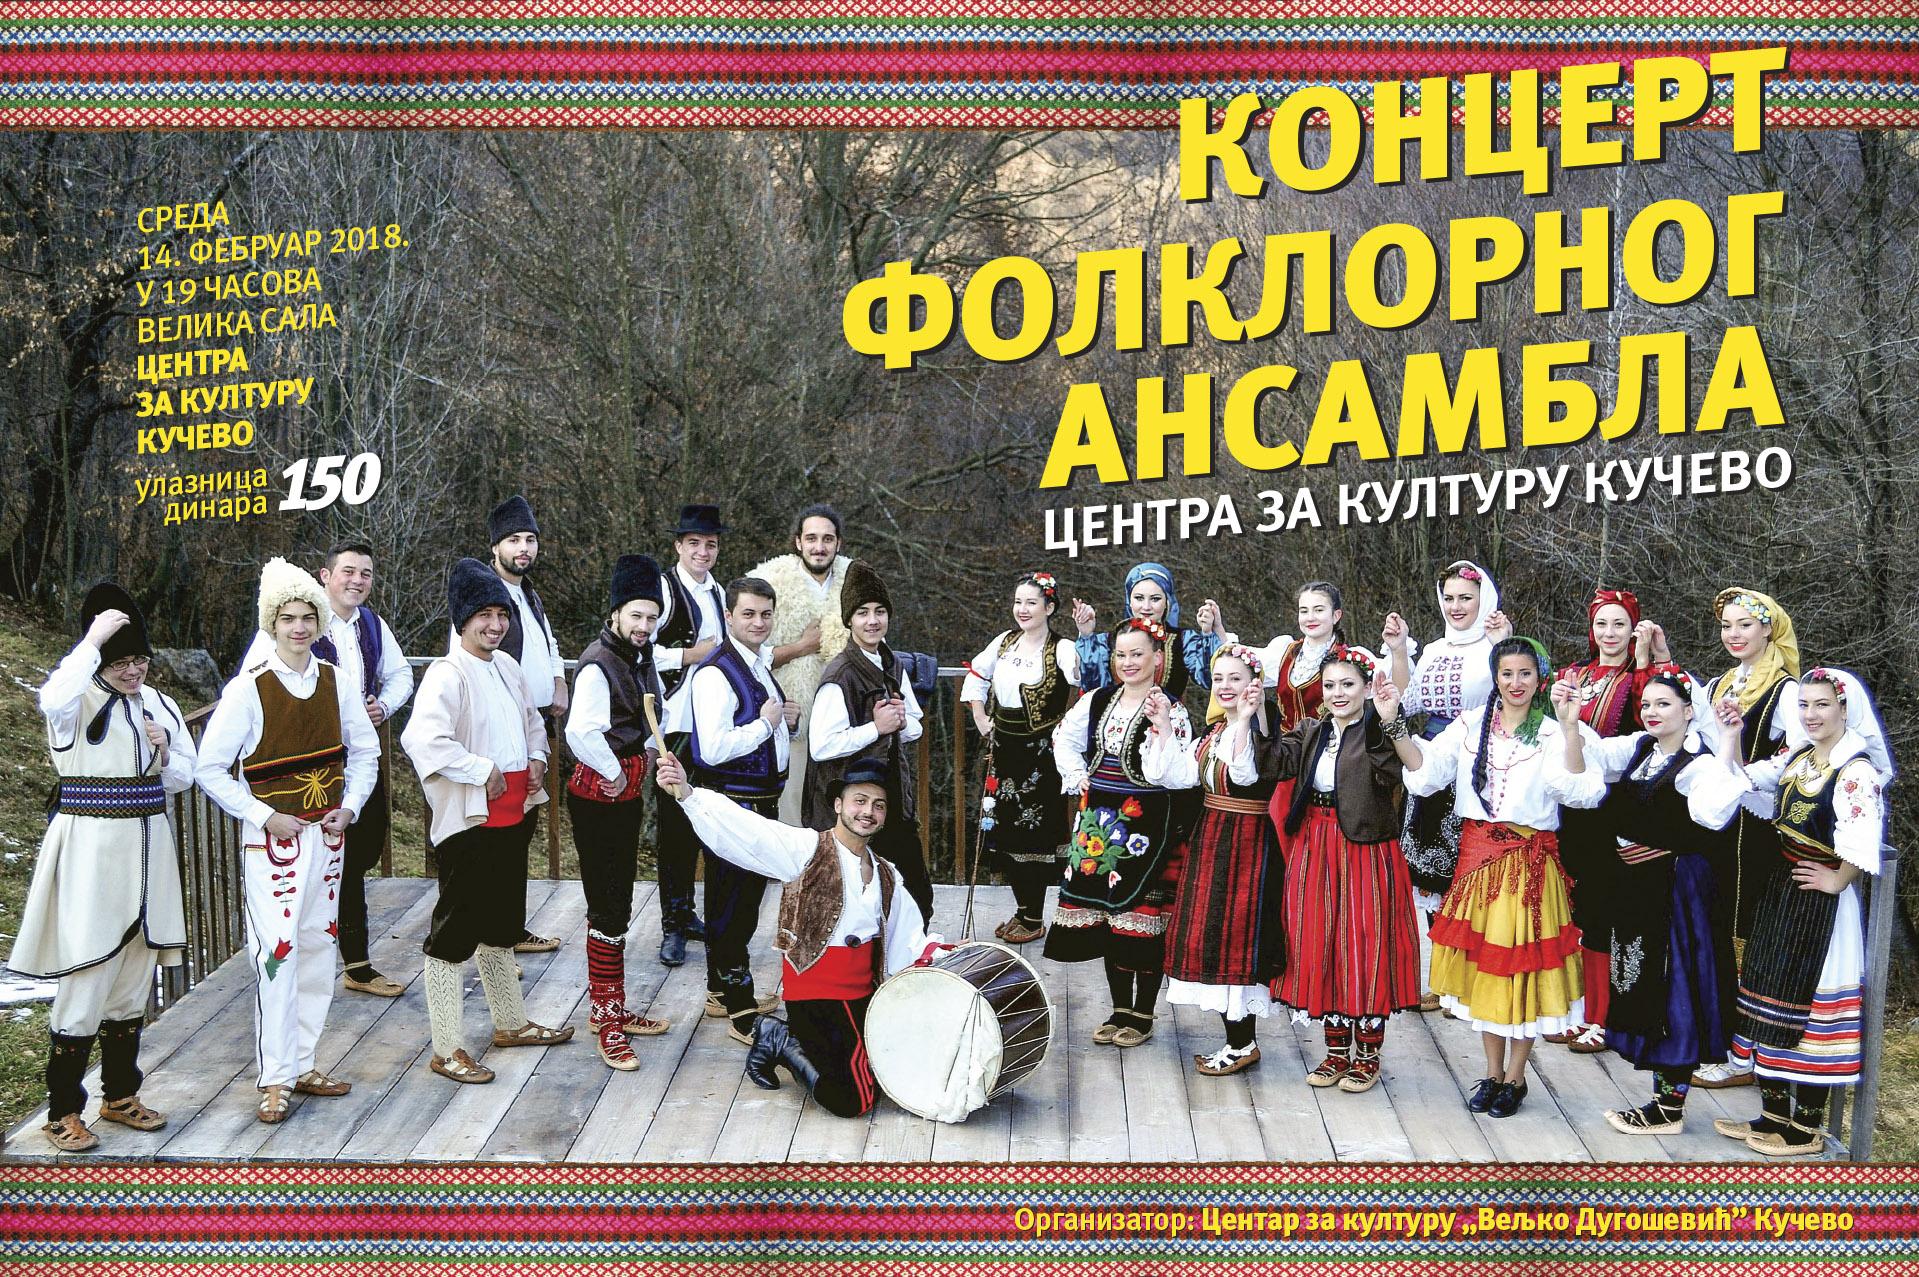 Концерт Фолклорног ансамбла Центра за културу